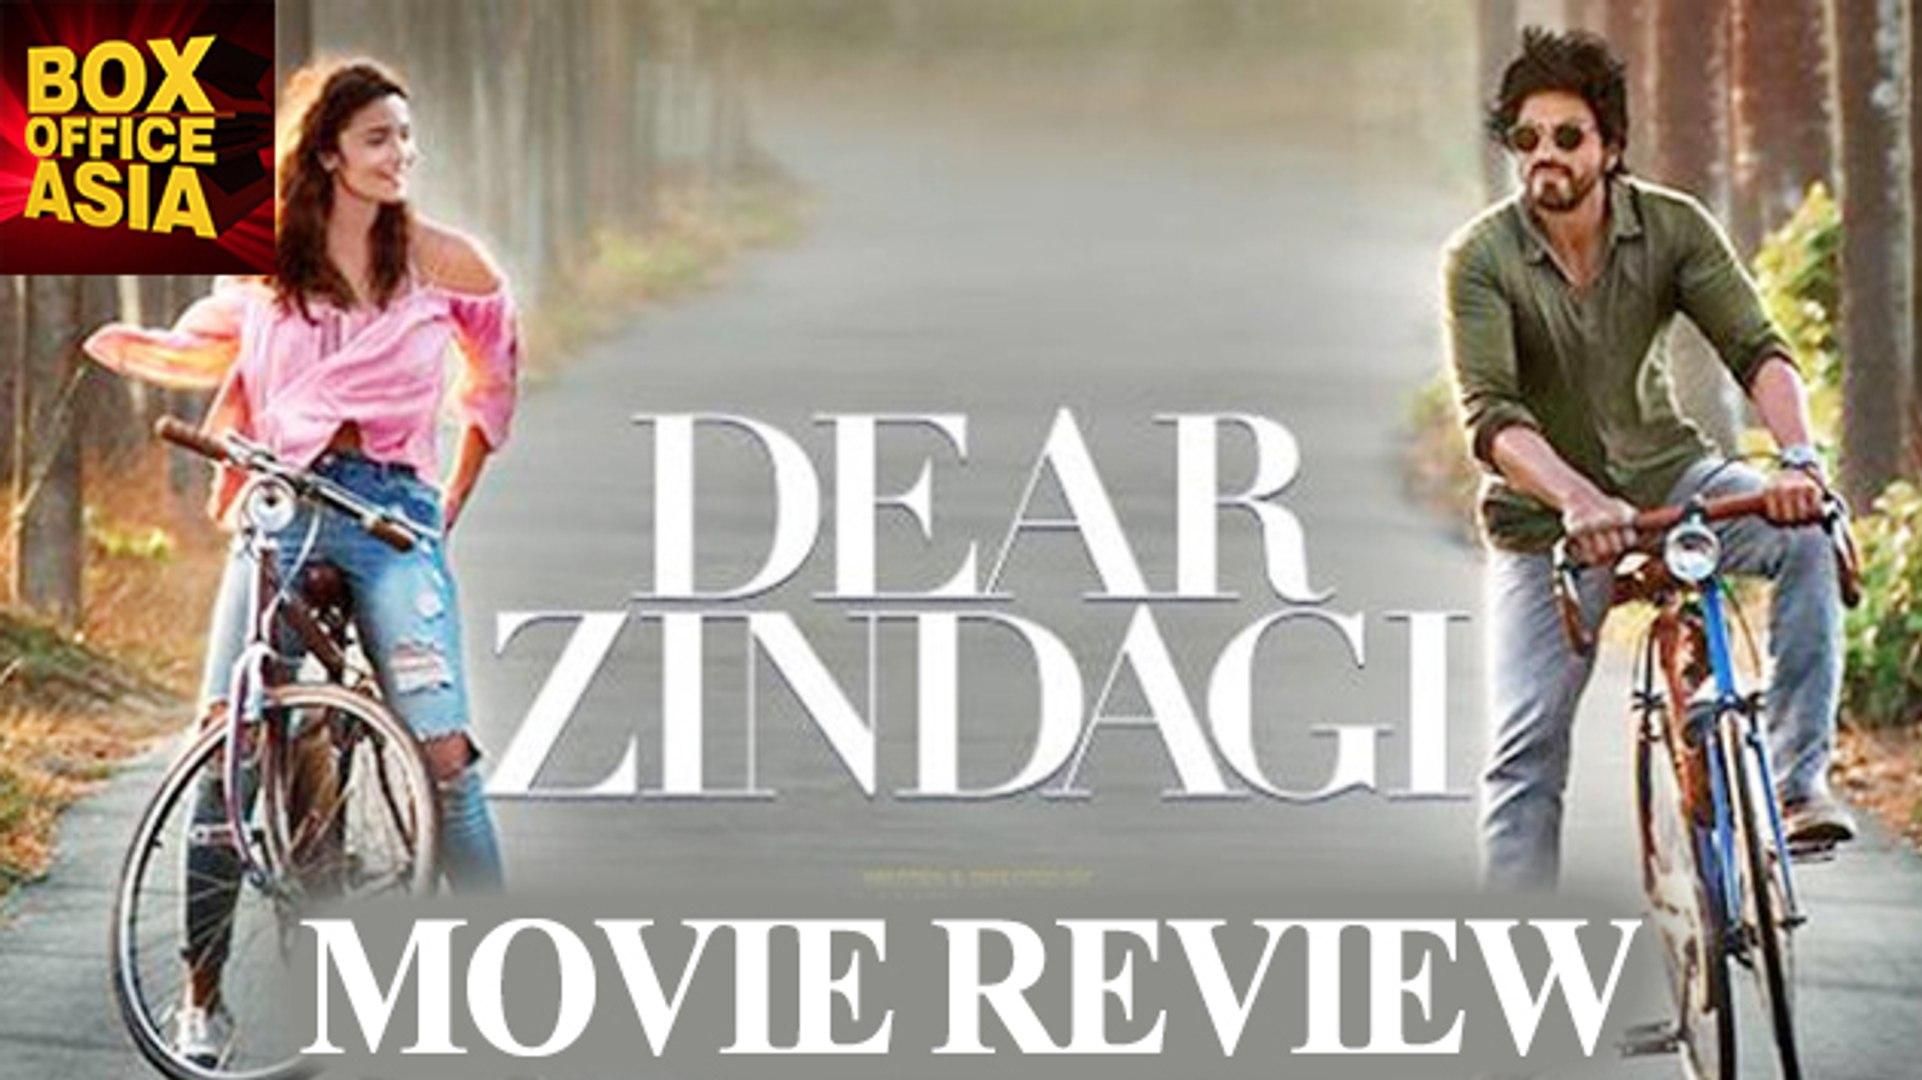 Dear Zindagi Movie Review| Shahrukh Khan| Alia Bhatt| Gauri Shinde | Box Office Asia